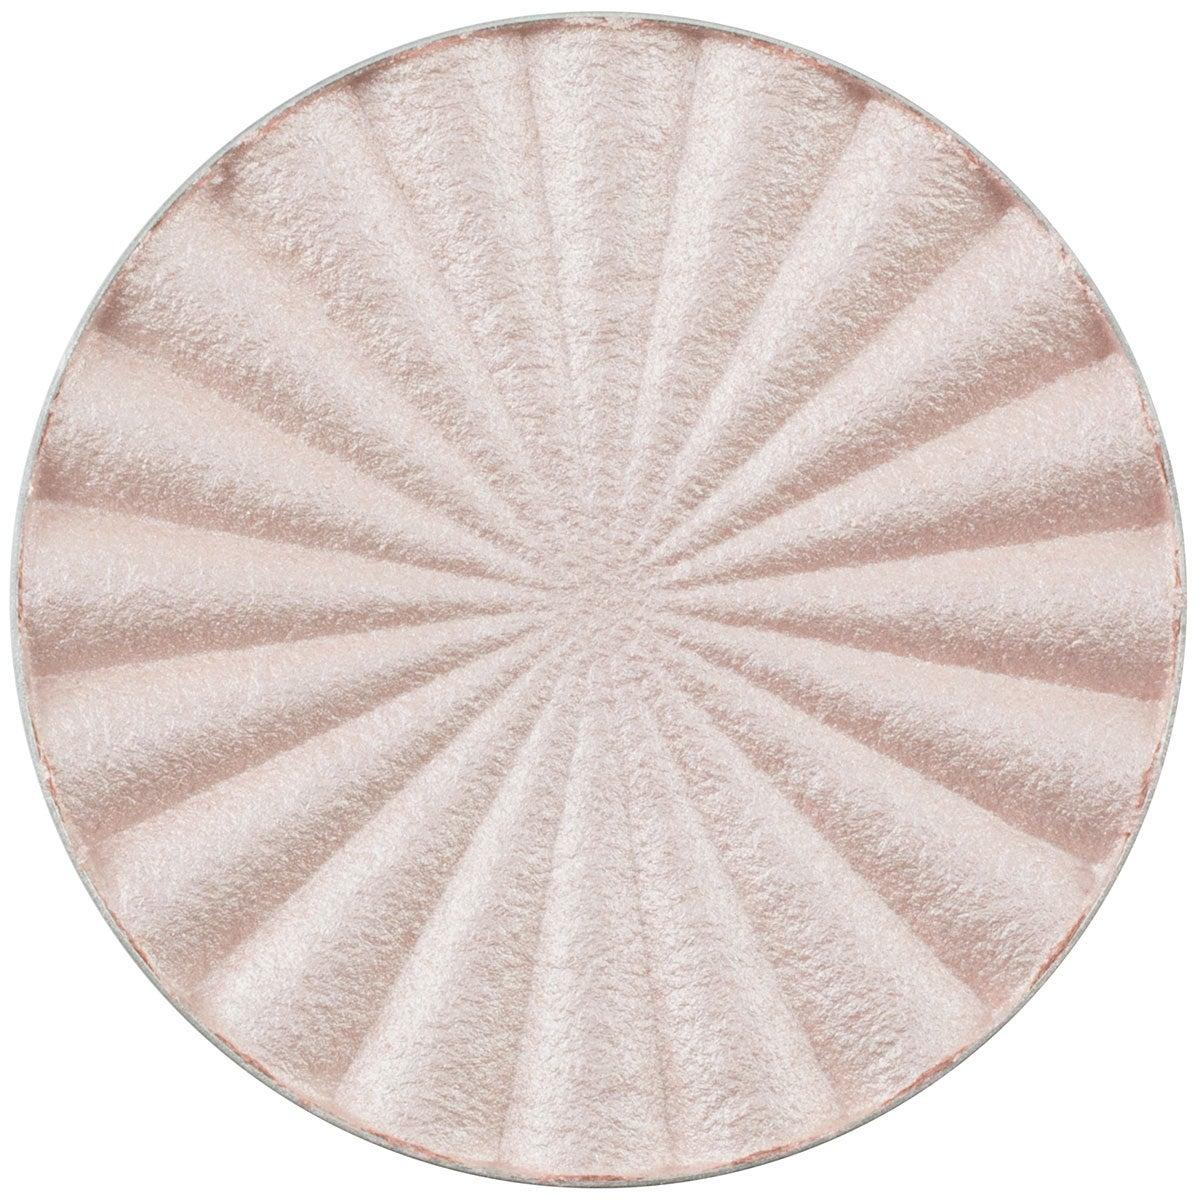 Mini Blissful Highlighter, Refill 4 g OFRA Cosmetics Highlighter